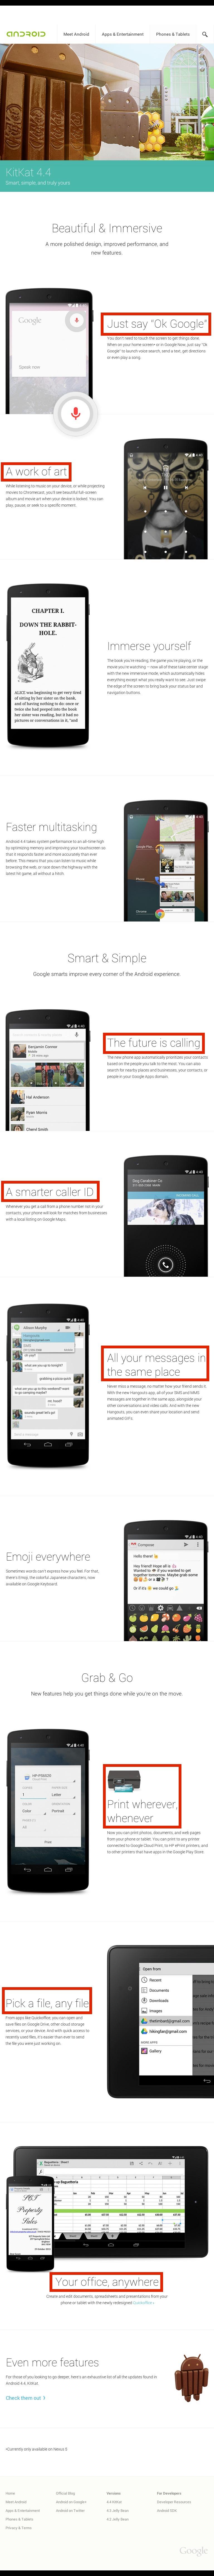 Android - 4.4 KitKat